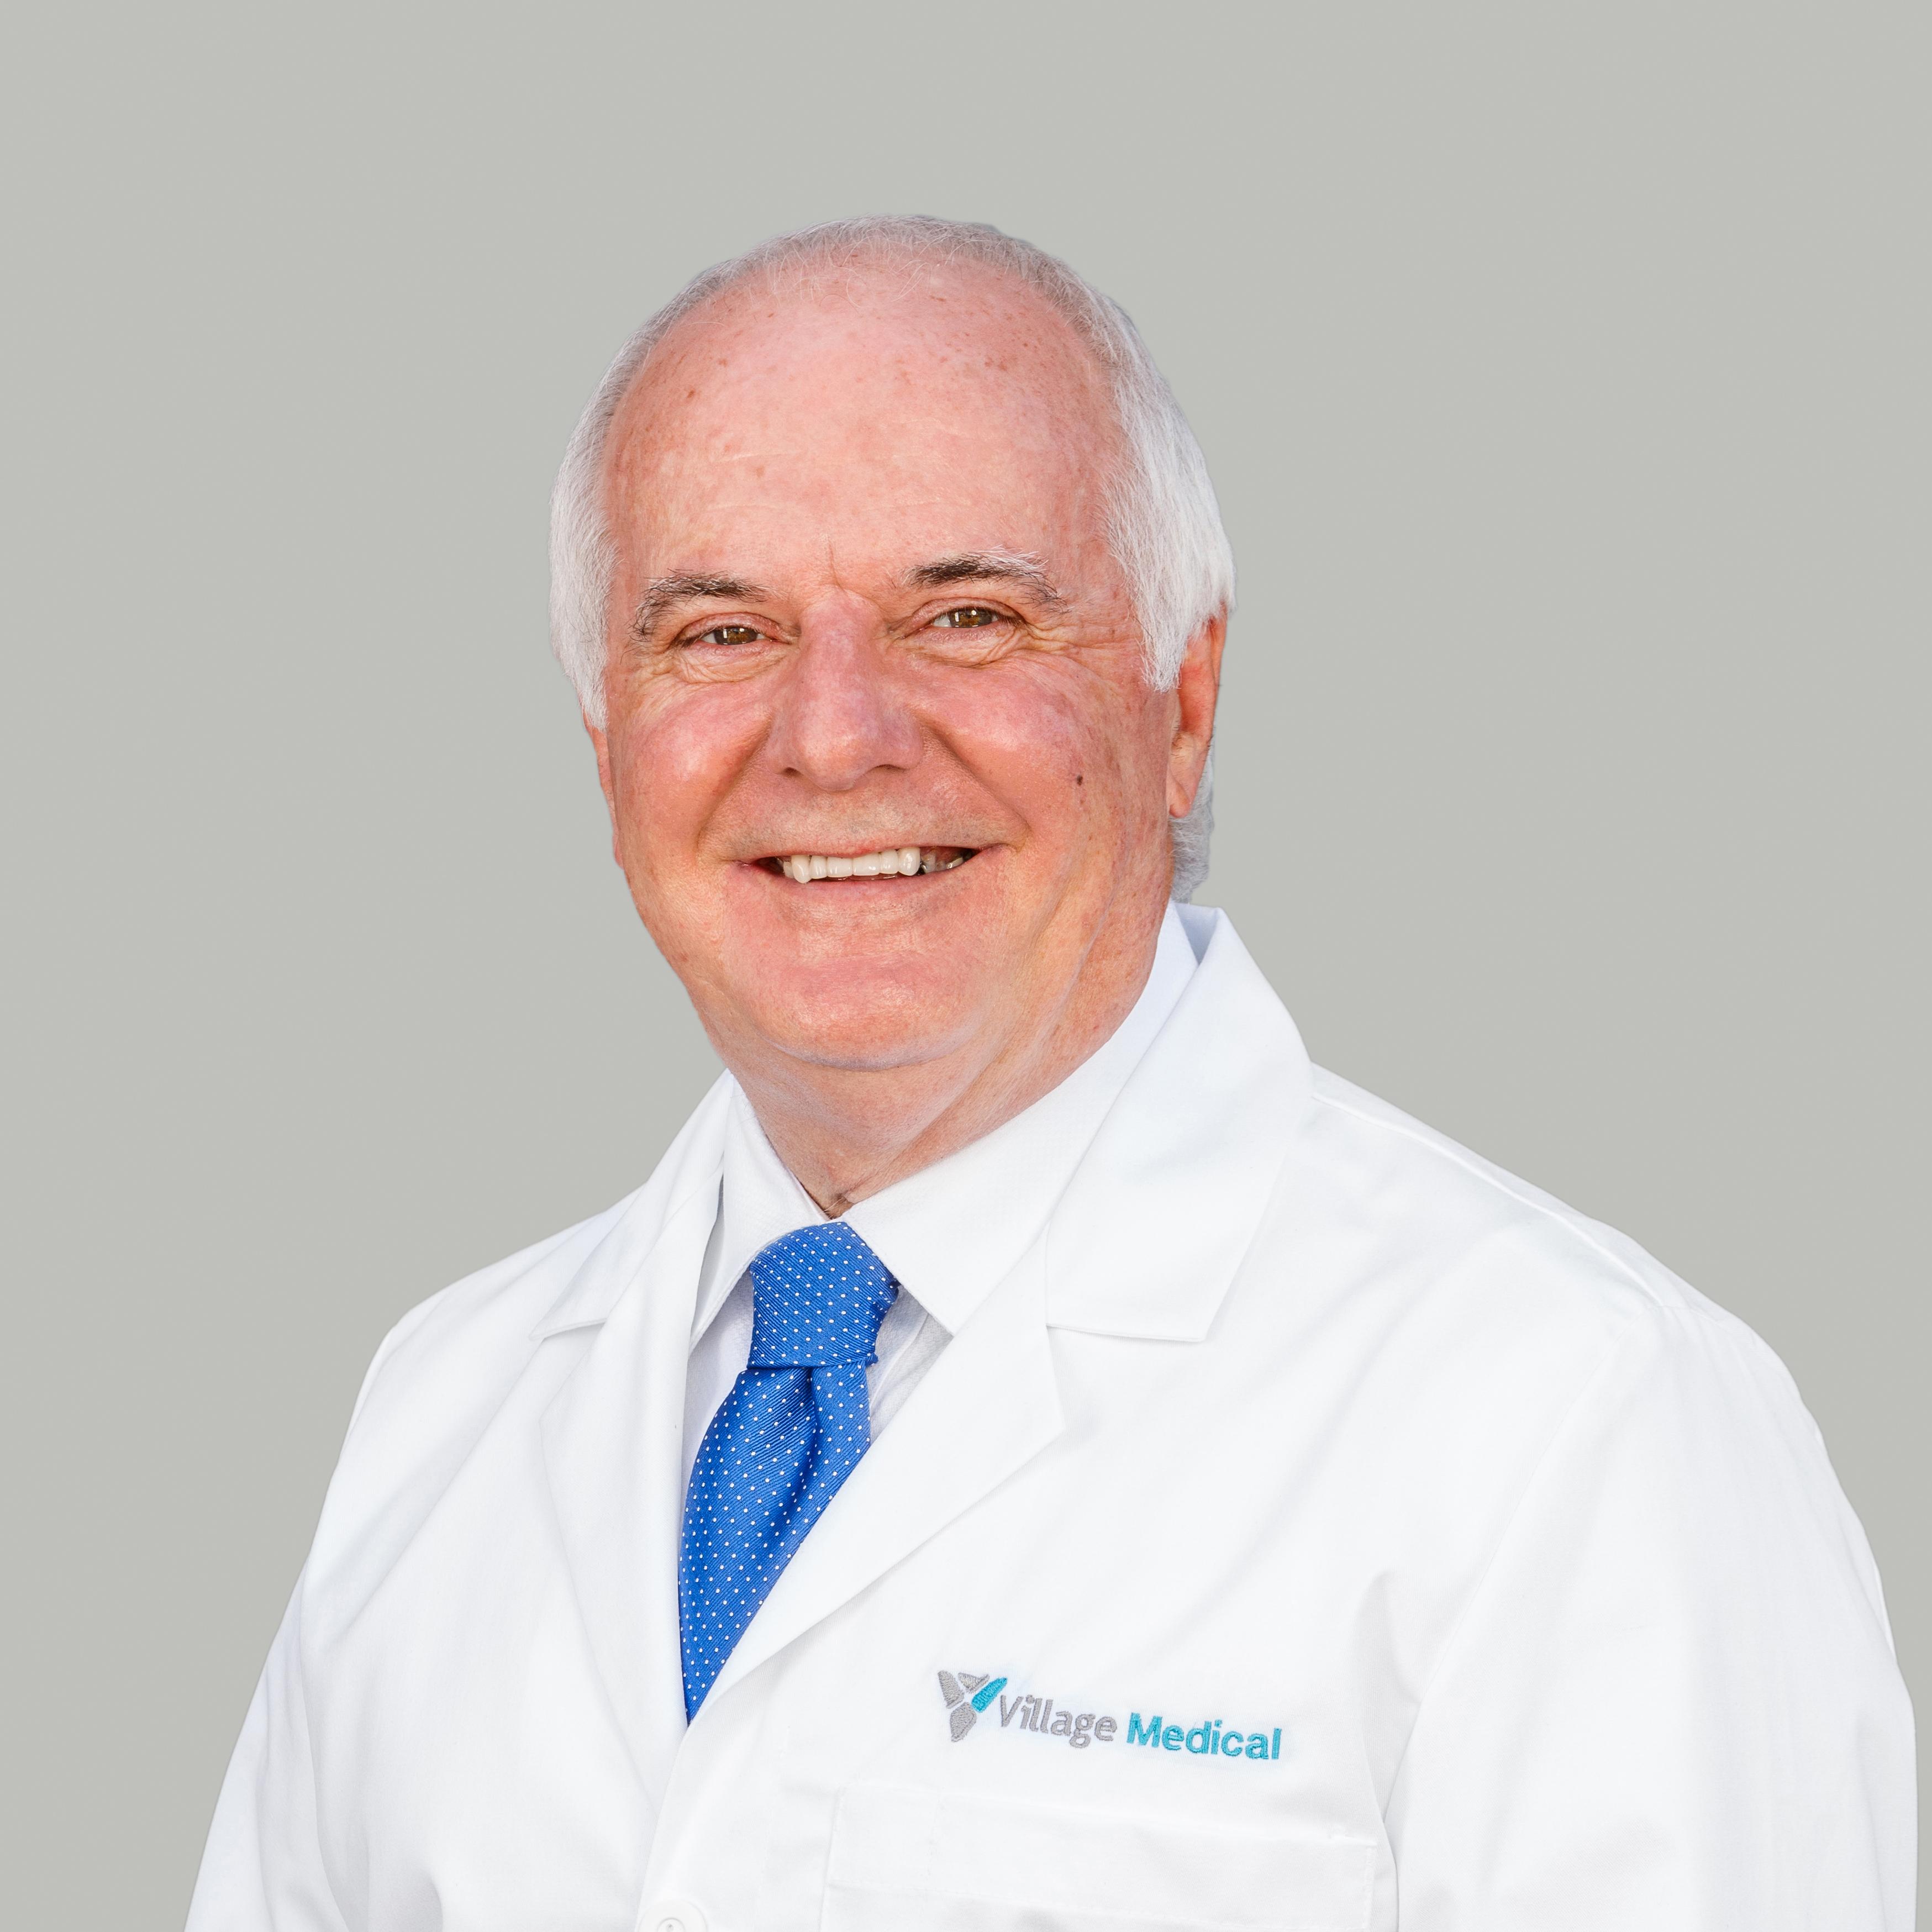 Robert Hughes, MD